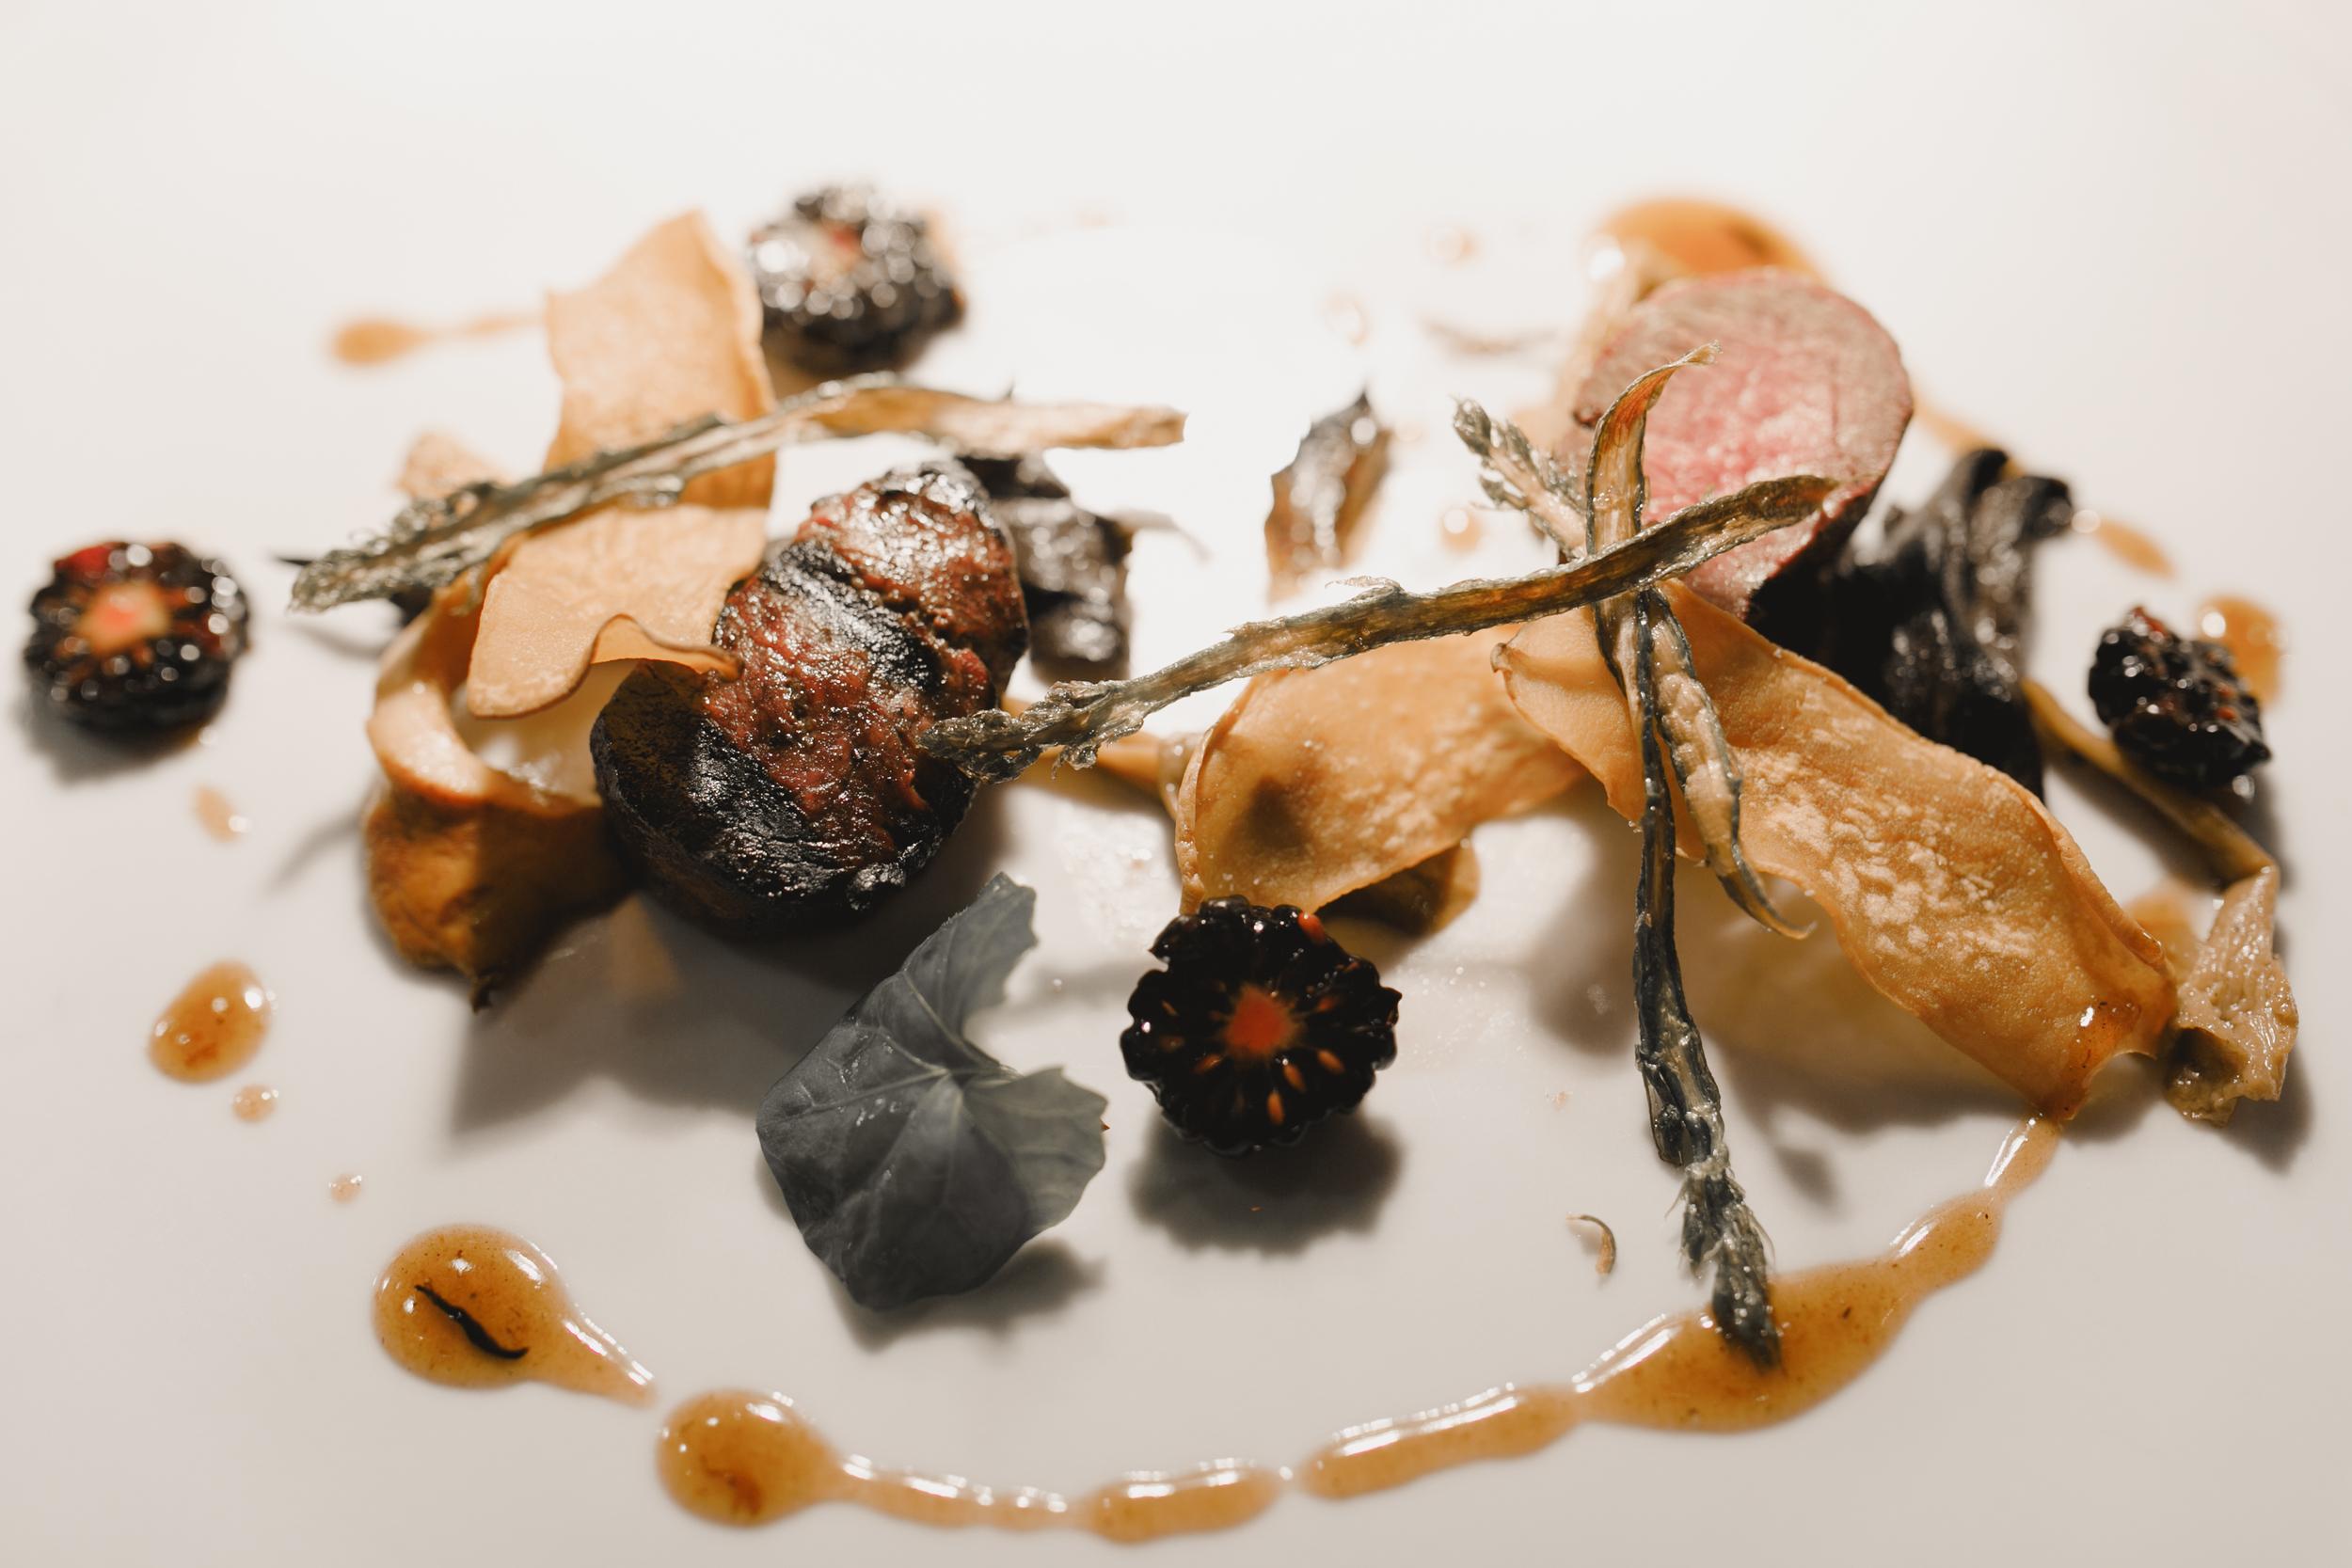 Venison: Eryngii Chips, Glazed Wild Mushrooms, Blackberry, Asparagus